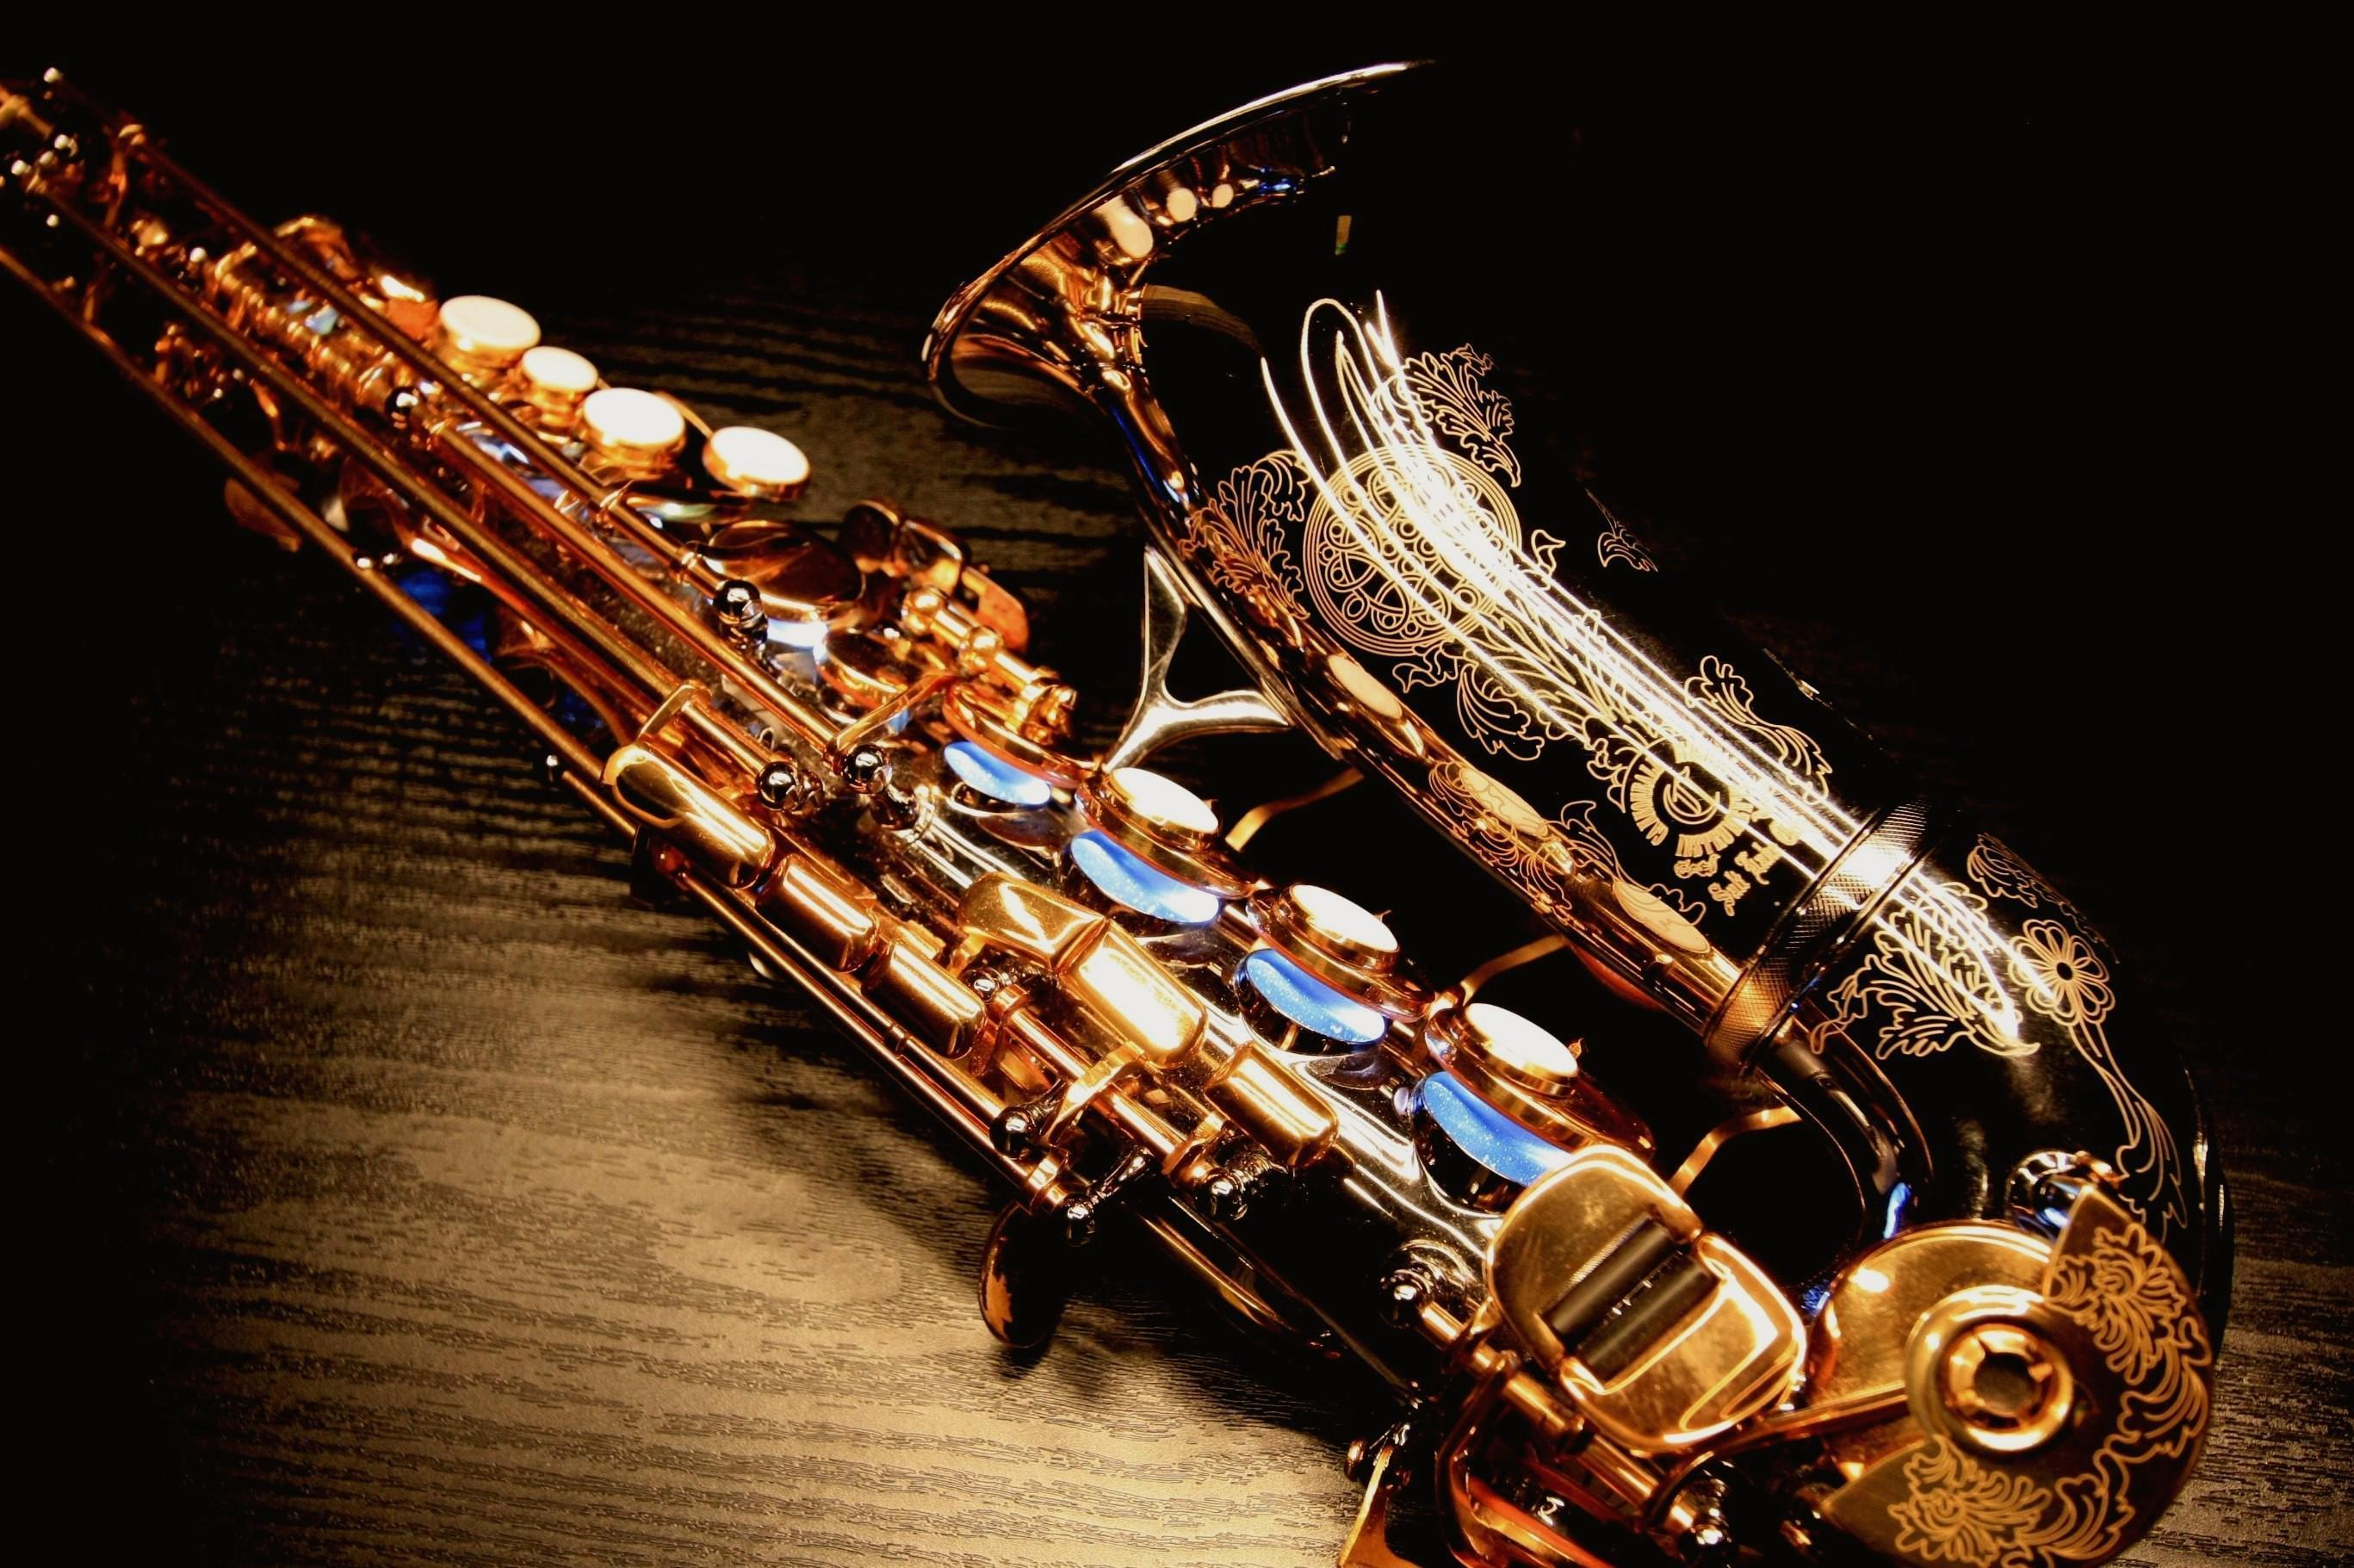 Saxophone Wallpaper Phone | sandy | Pinterest | Saxophones and ...